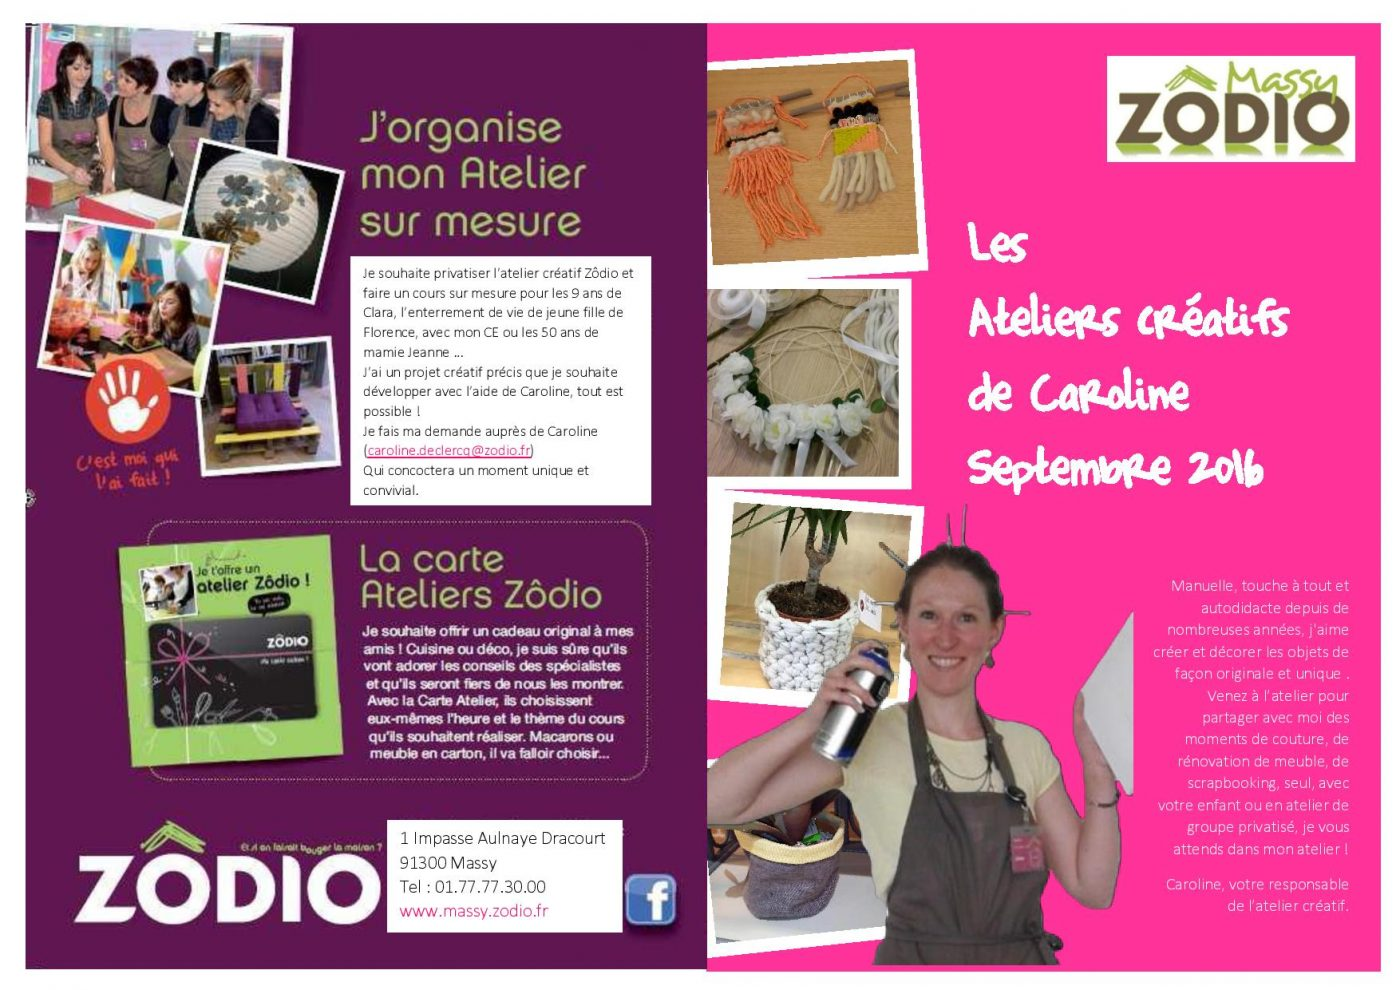 Planning Atelier Creatif Septembre 2016 Zodio Massy Blog Zodio